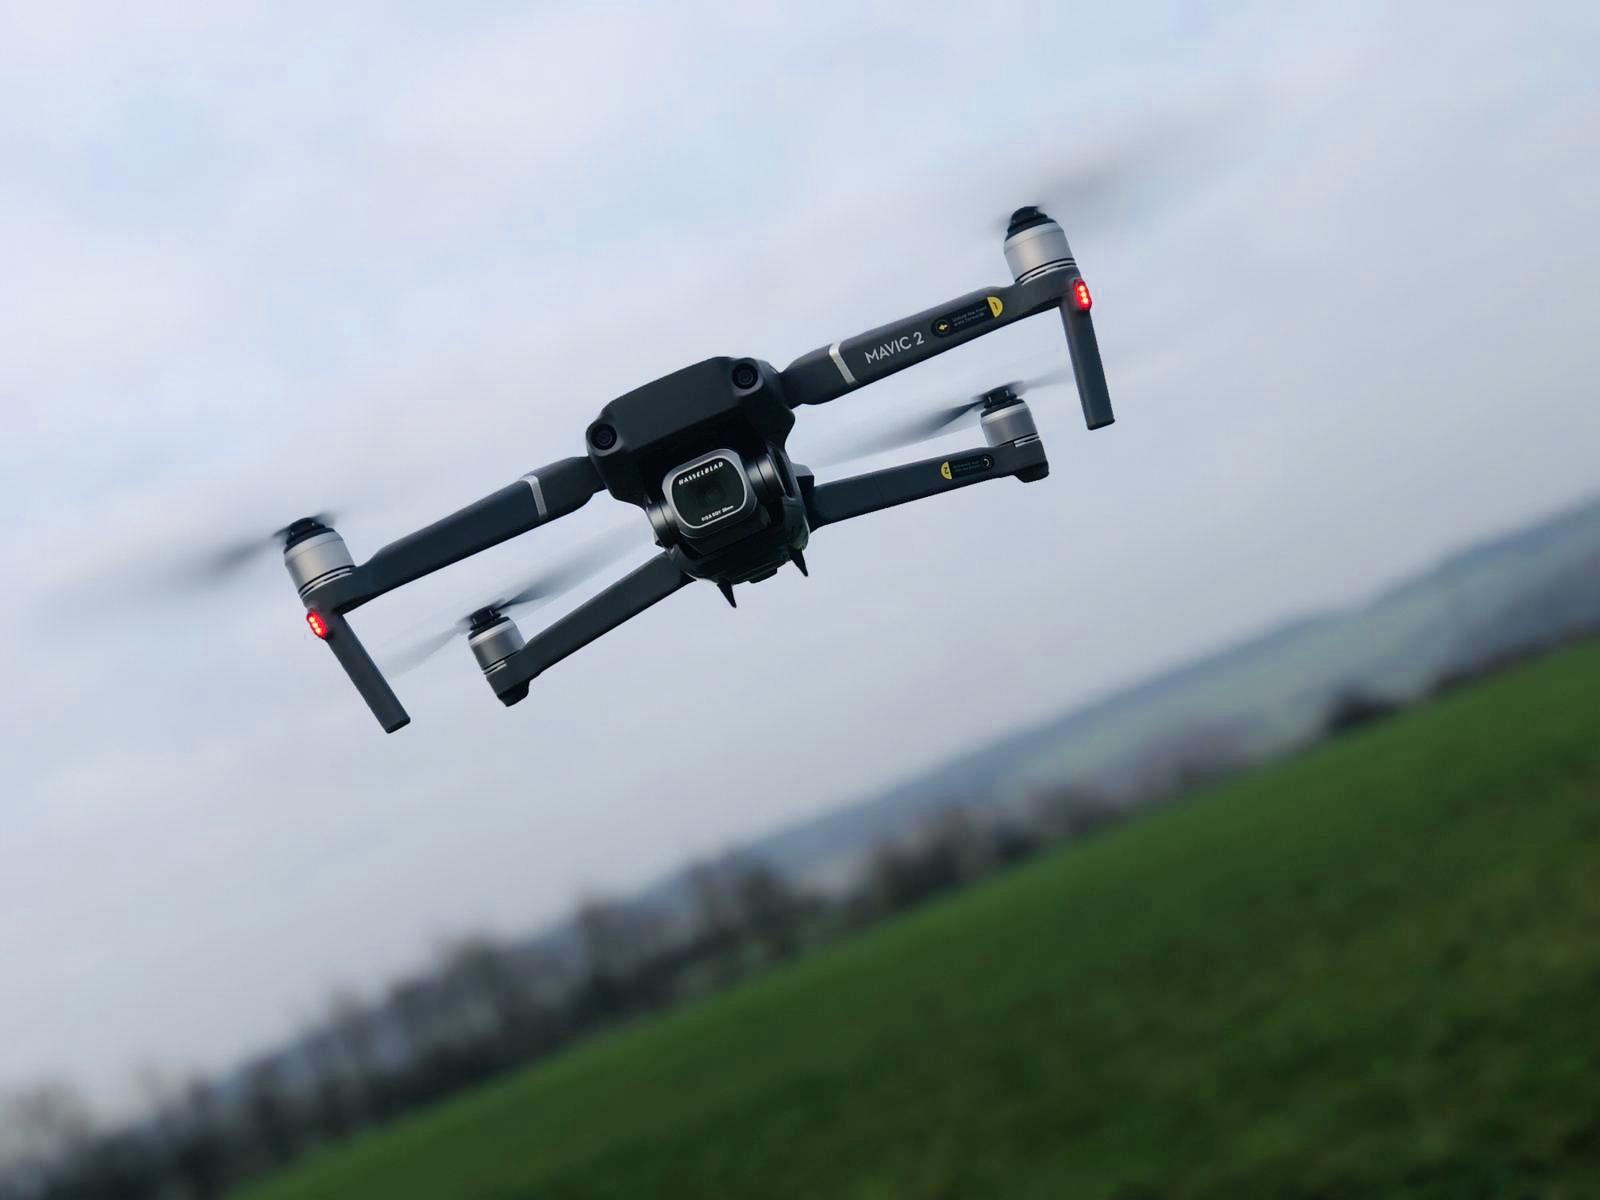 Mavic 2 Drone Photography.jpg